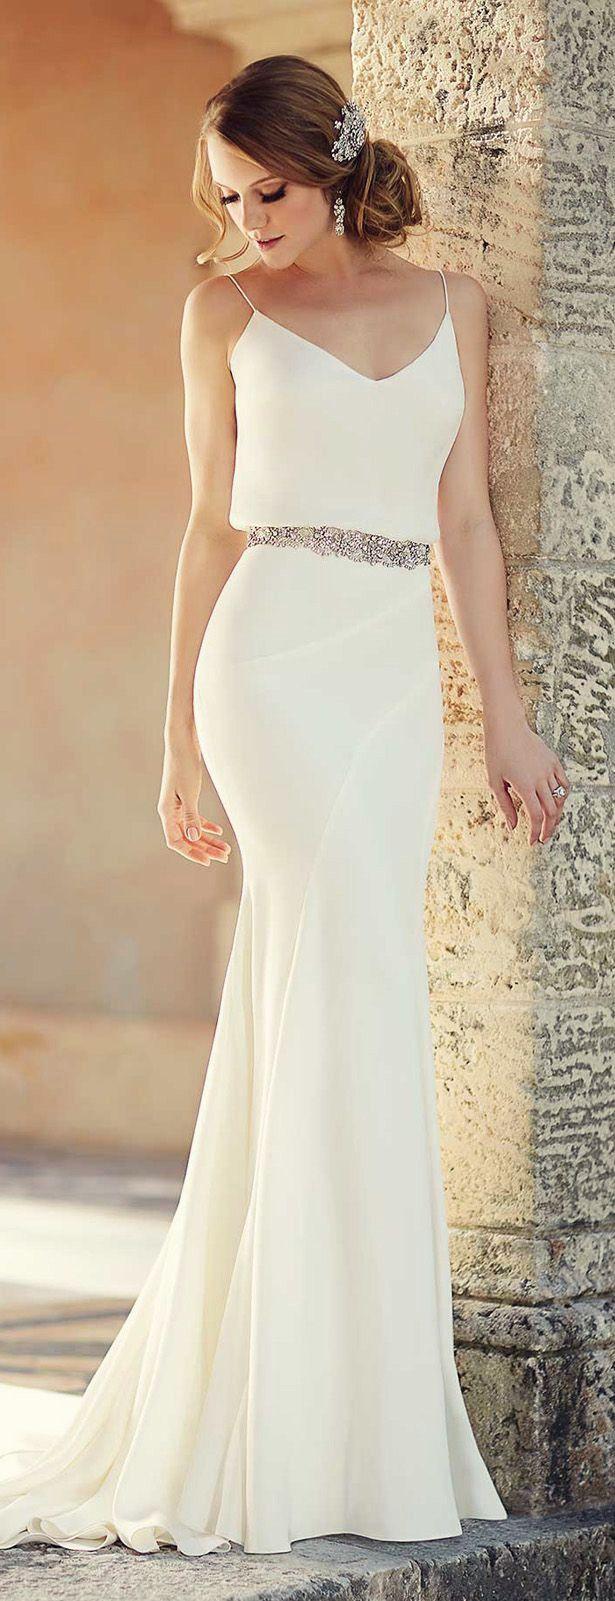 Wedding dress wedding dresses long dresses pinterest wedding